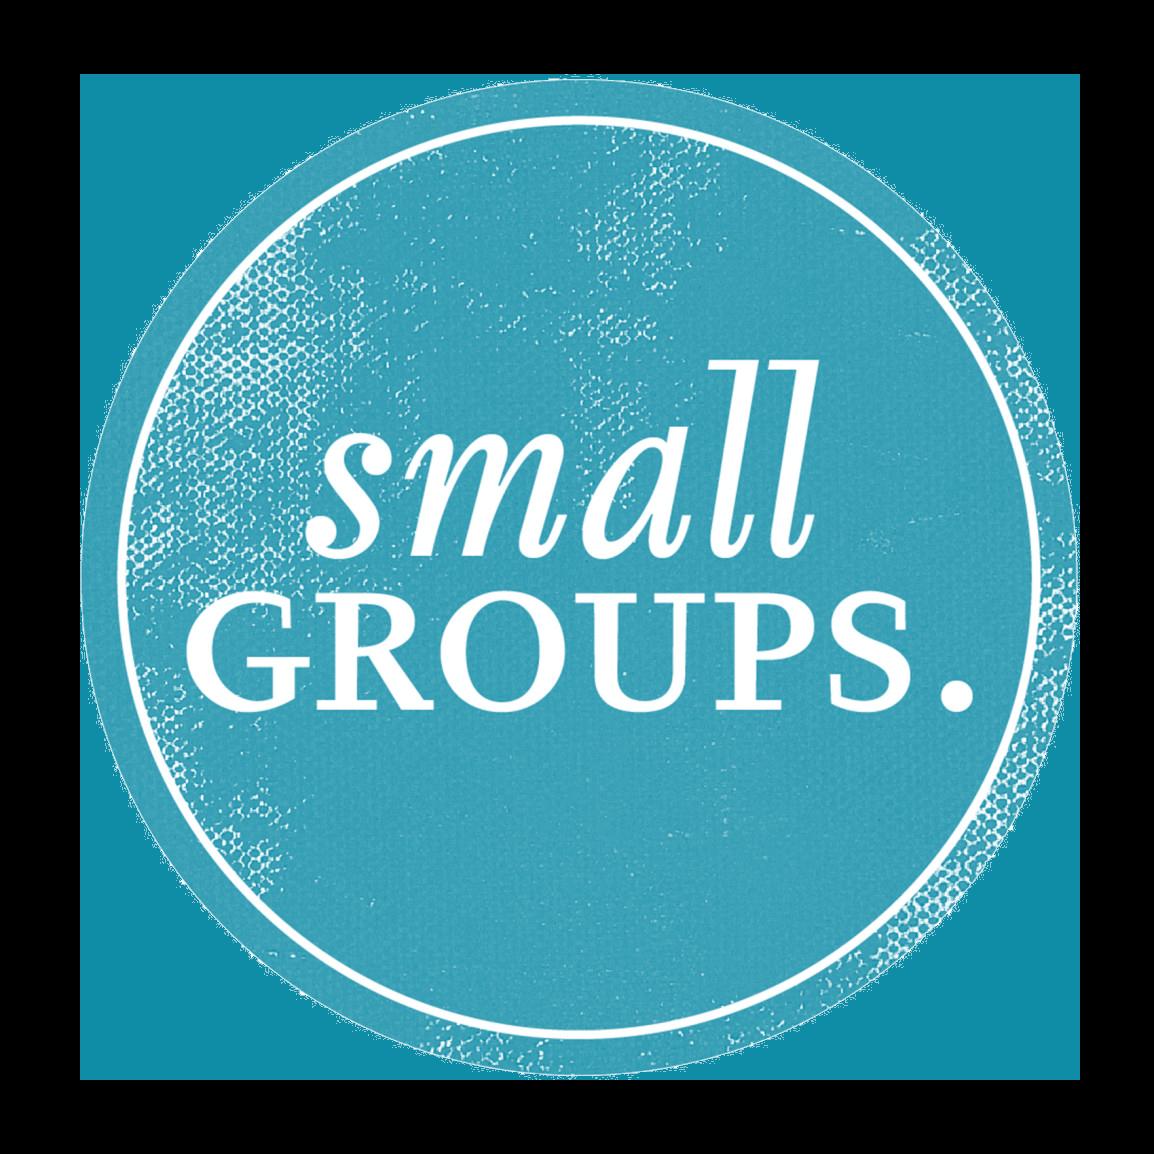 https://mlupbpowctwx.i.optimole.com/Il9yXok-voQkE3DE/w:auto/h:auto/q:76/https://www.oportosensationstour.com/wp-content/uploads/2020/06/smallgroups2-1154x1154-1.png